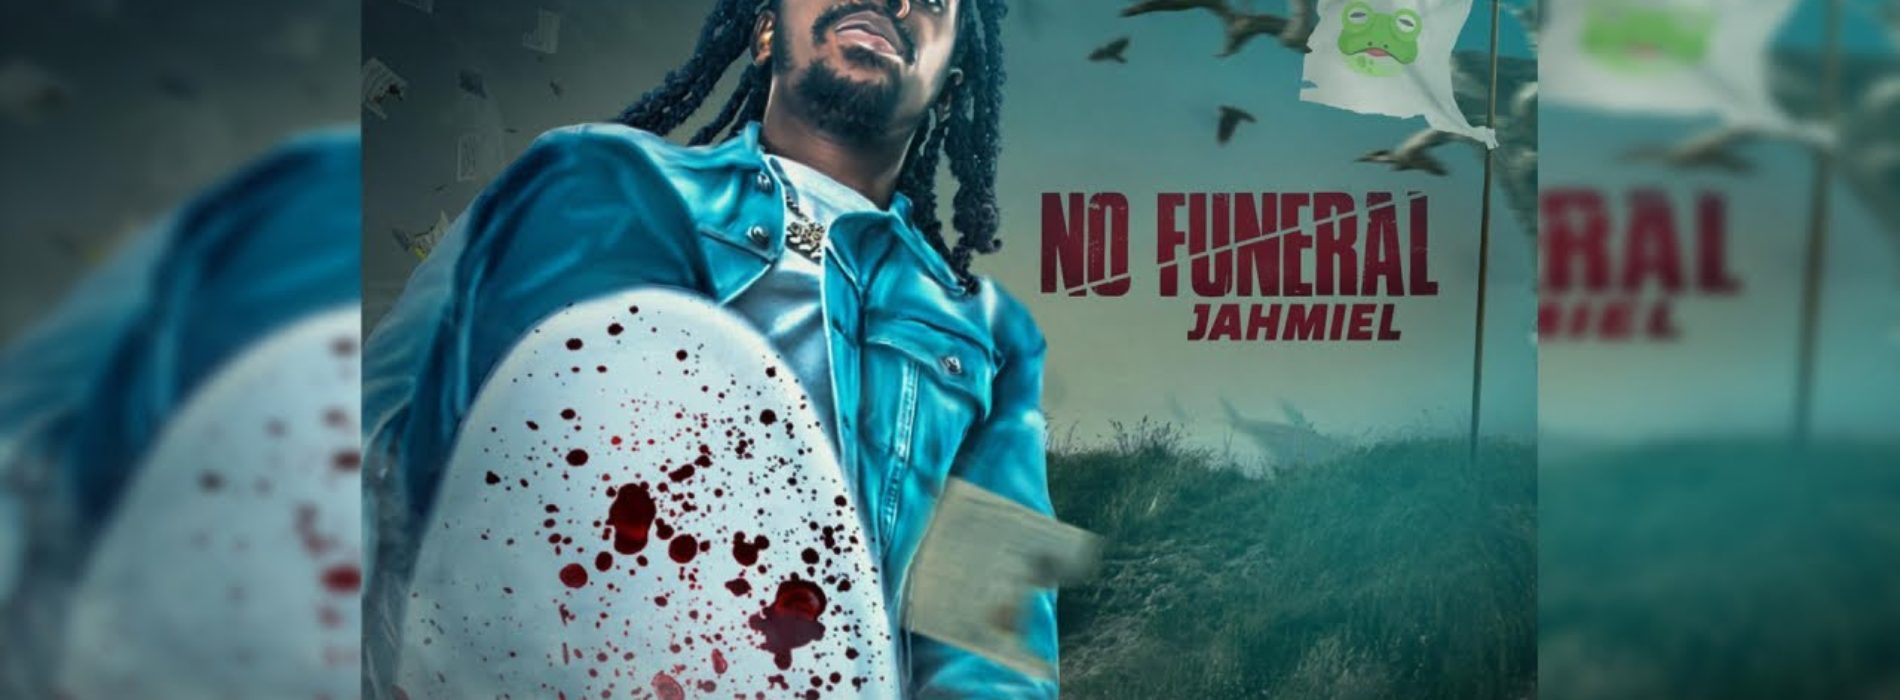 Jahmiel – No Funeral / Blak Ryno – Murderer (Official Audio) – Avril 2020